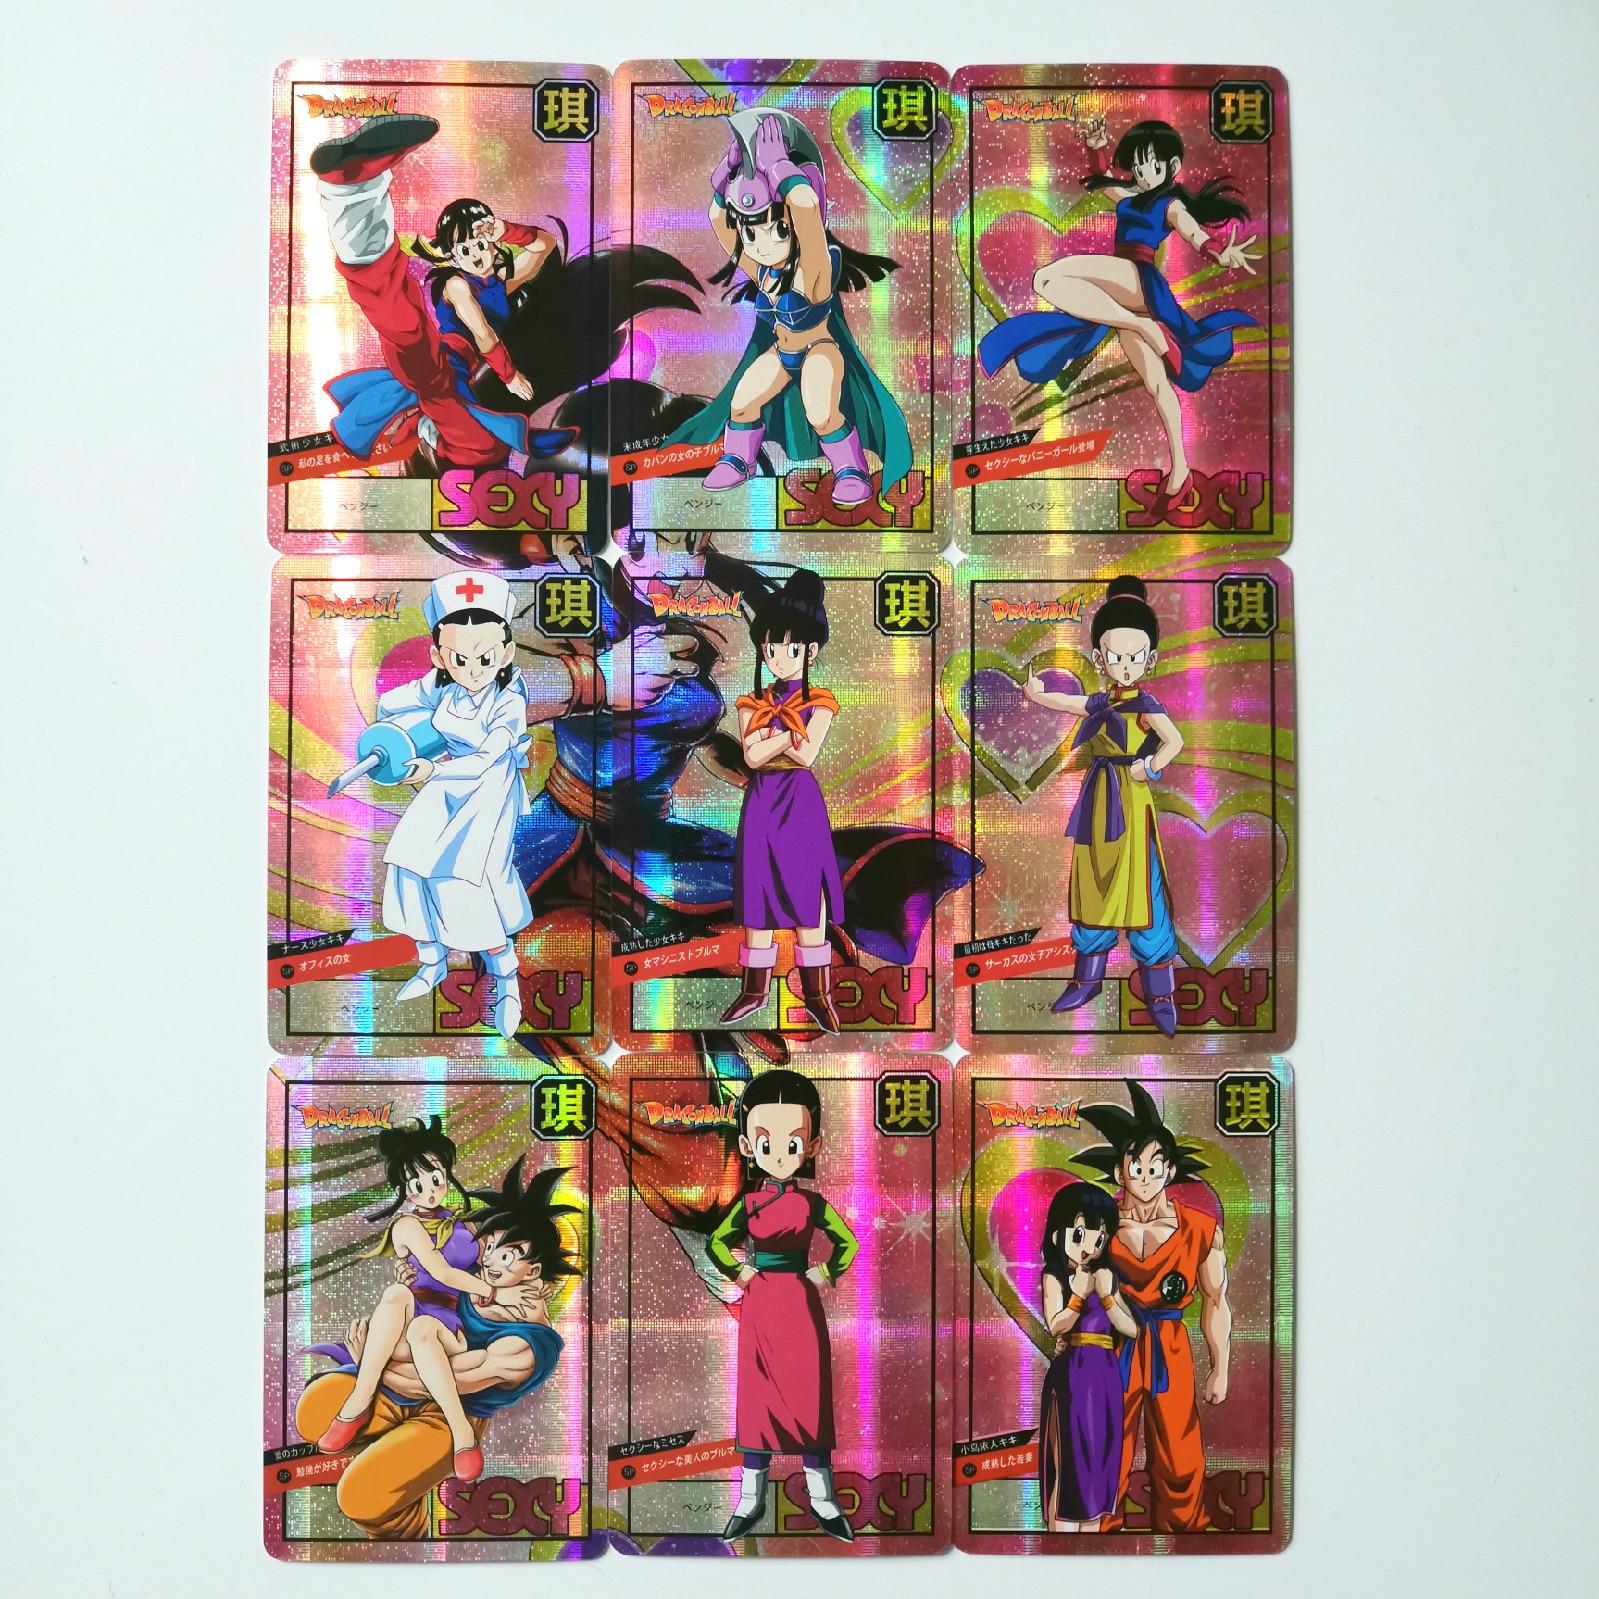 9pcs/set Chichi Super Dragon Ball Z Heroes Battle Card Ultra Instinct Goku Vegeta Game Collection Cards